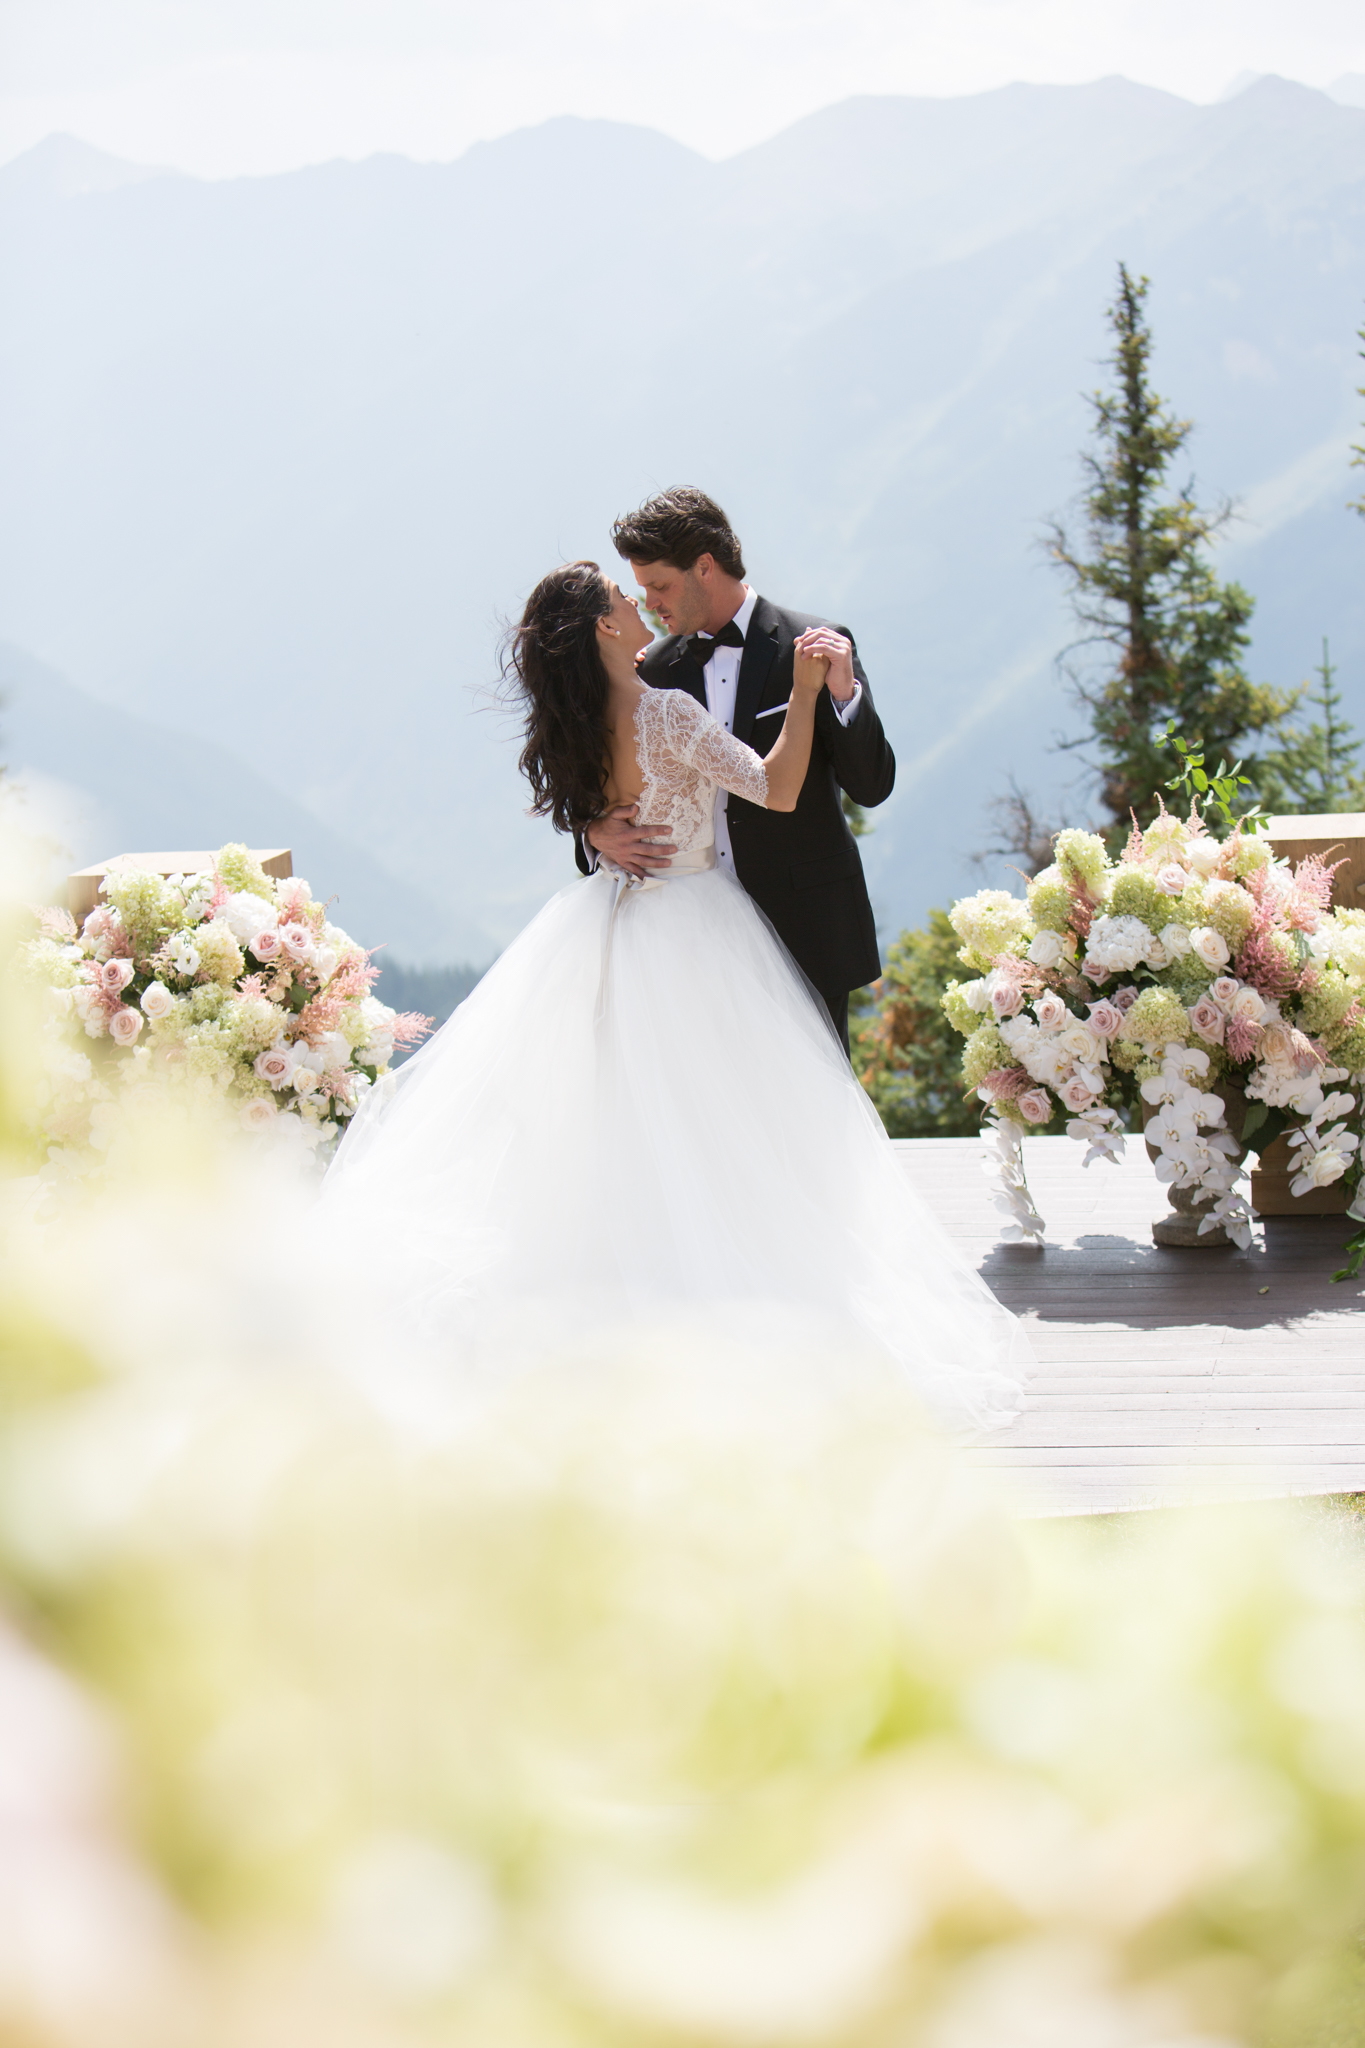 lady-ilg-photography-kathryn-kim-associate-colorado-wedding-photographer (3)